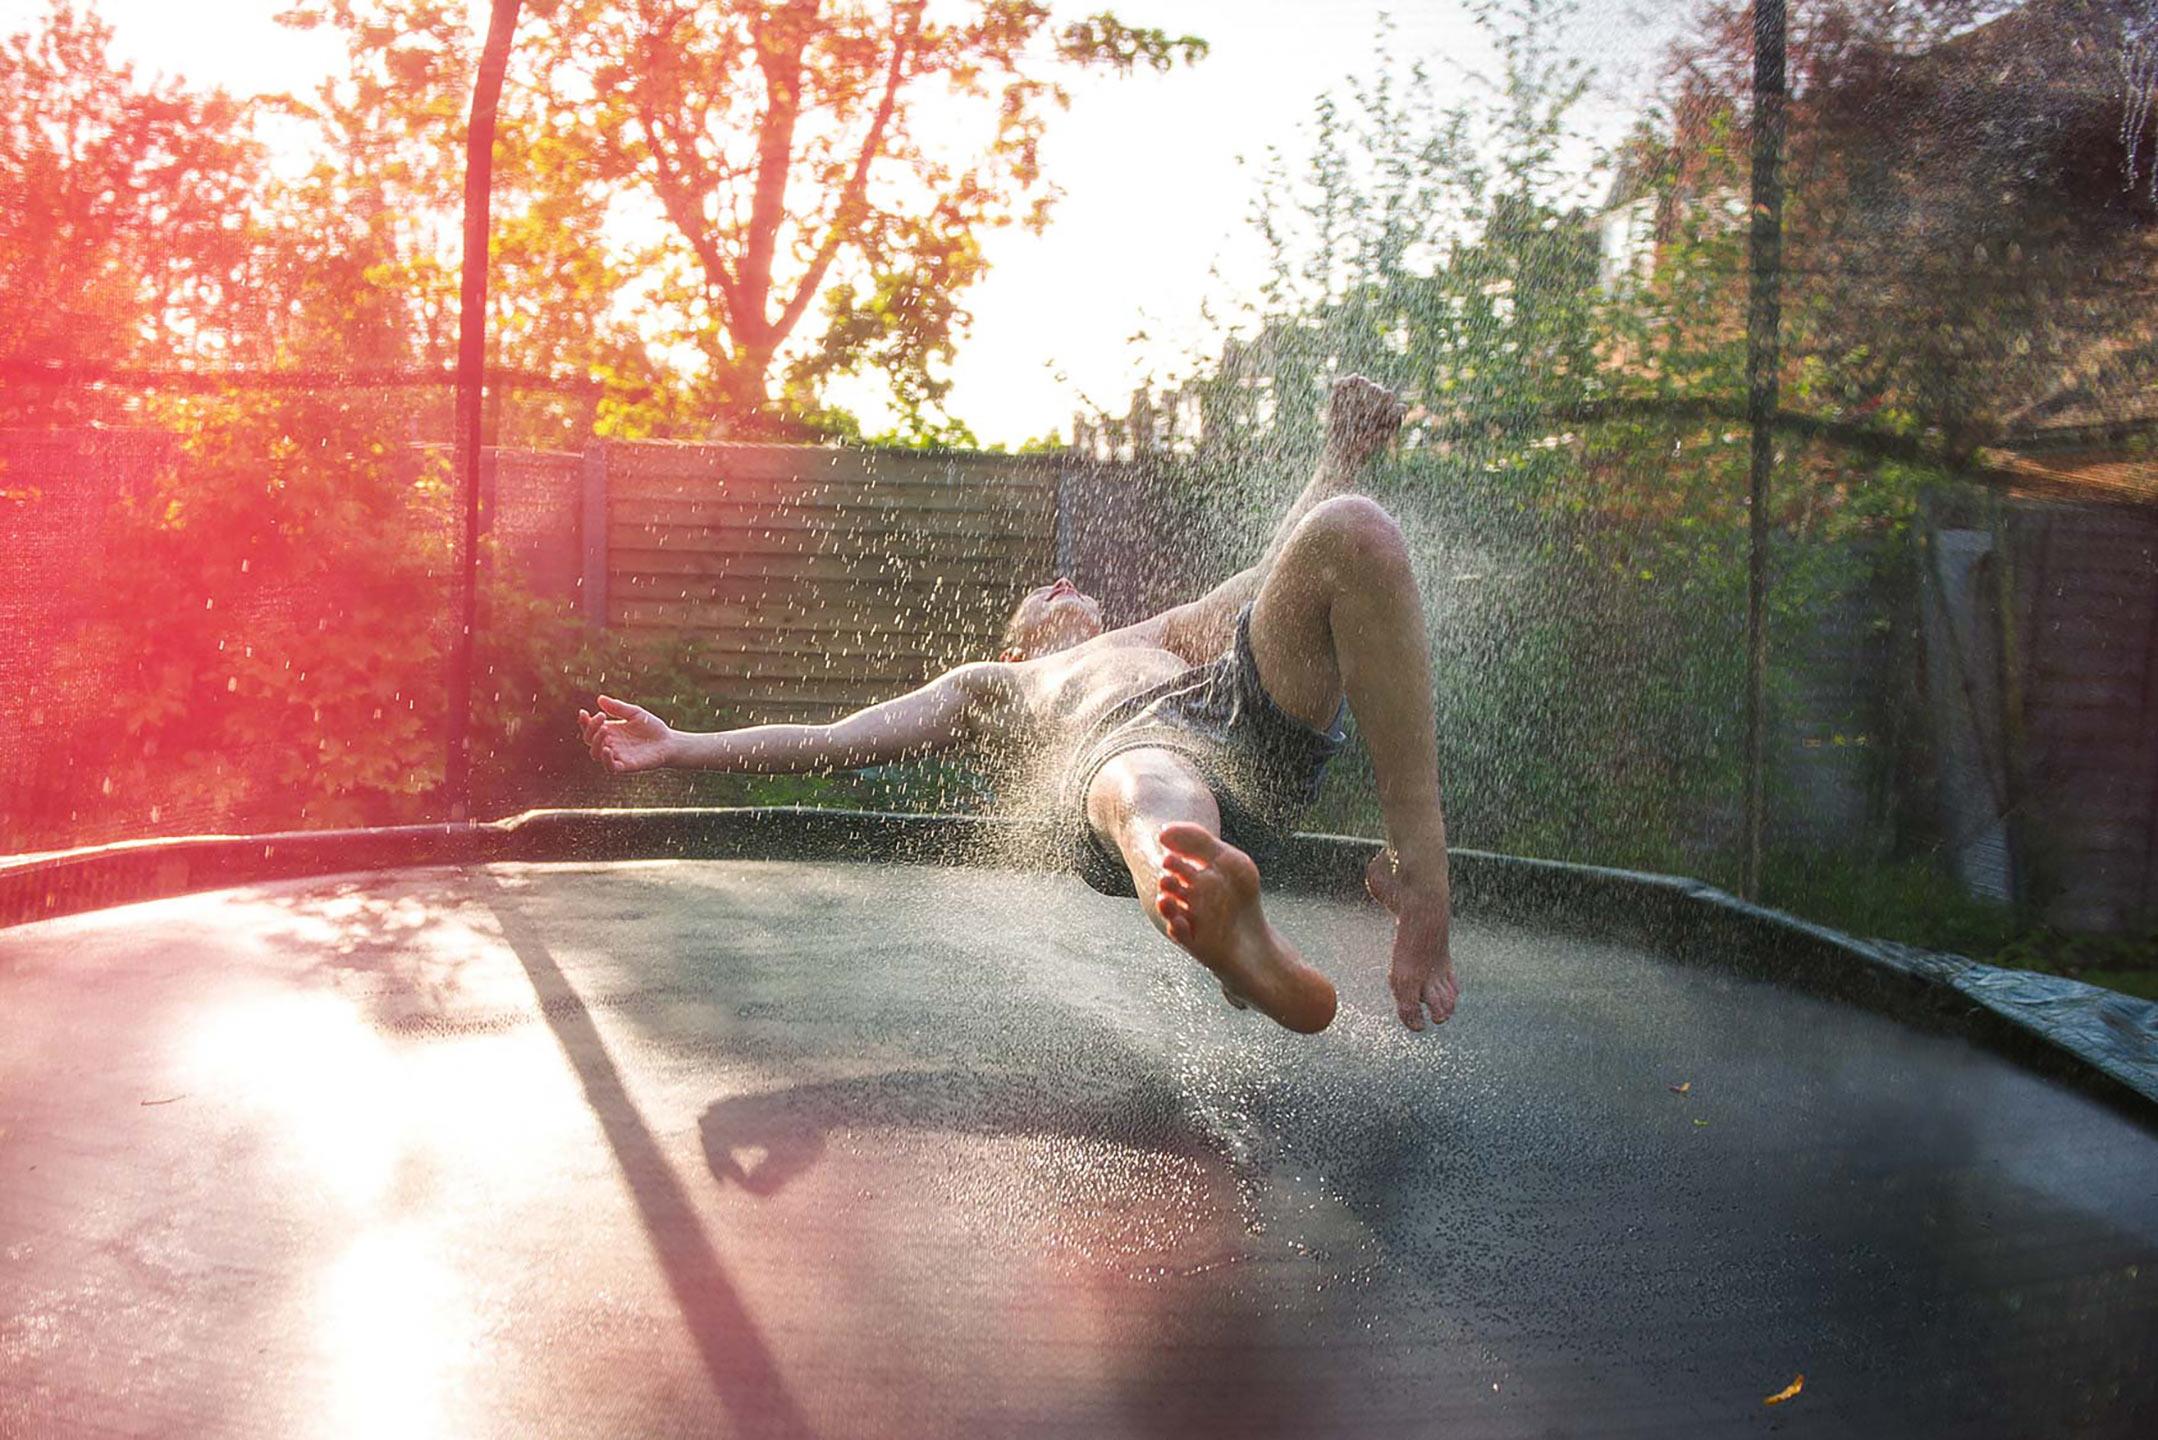 Dean Northcott - Girl on trampoline